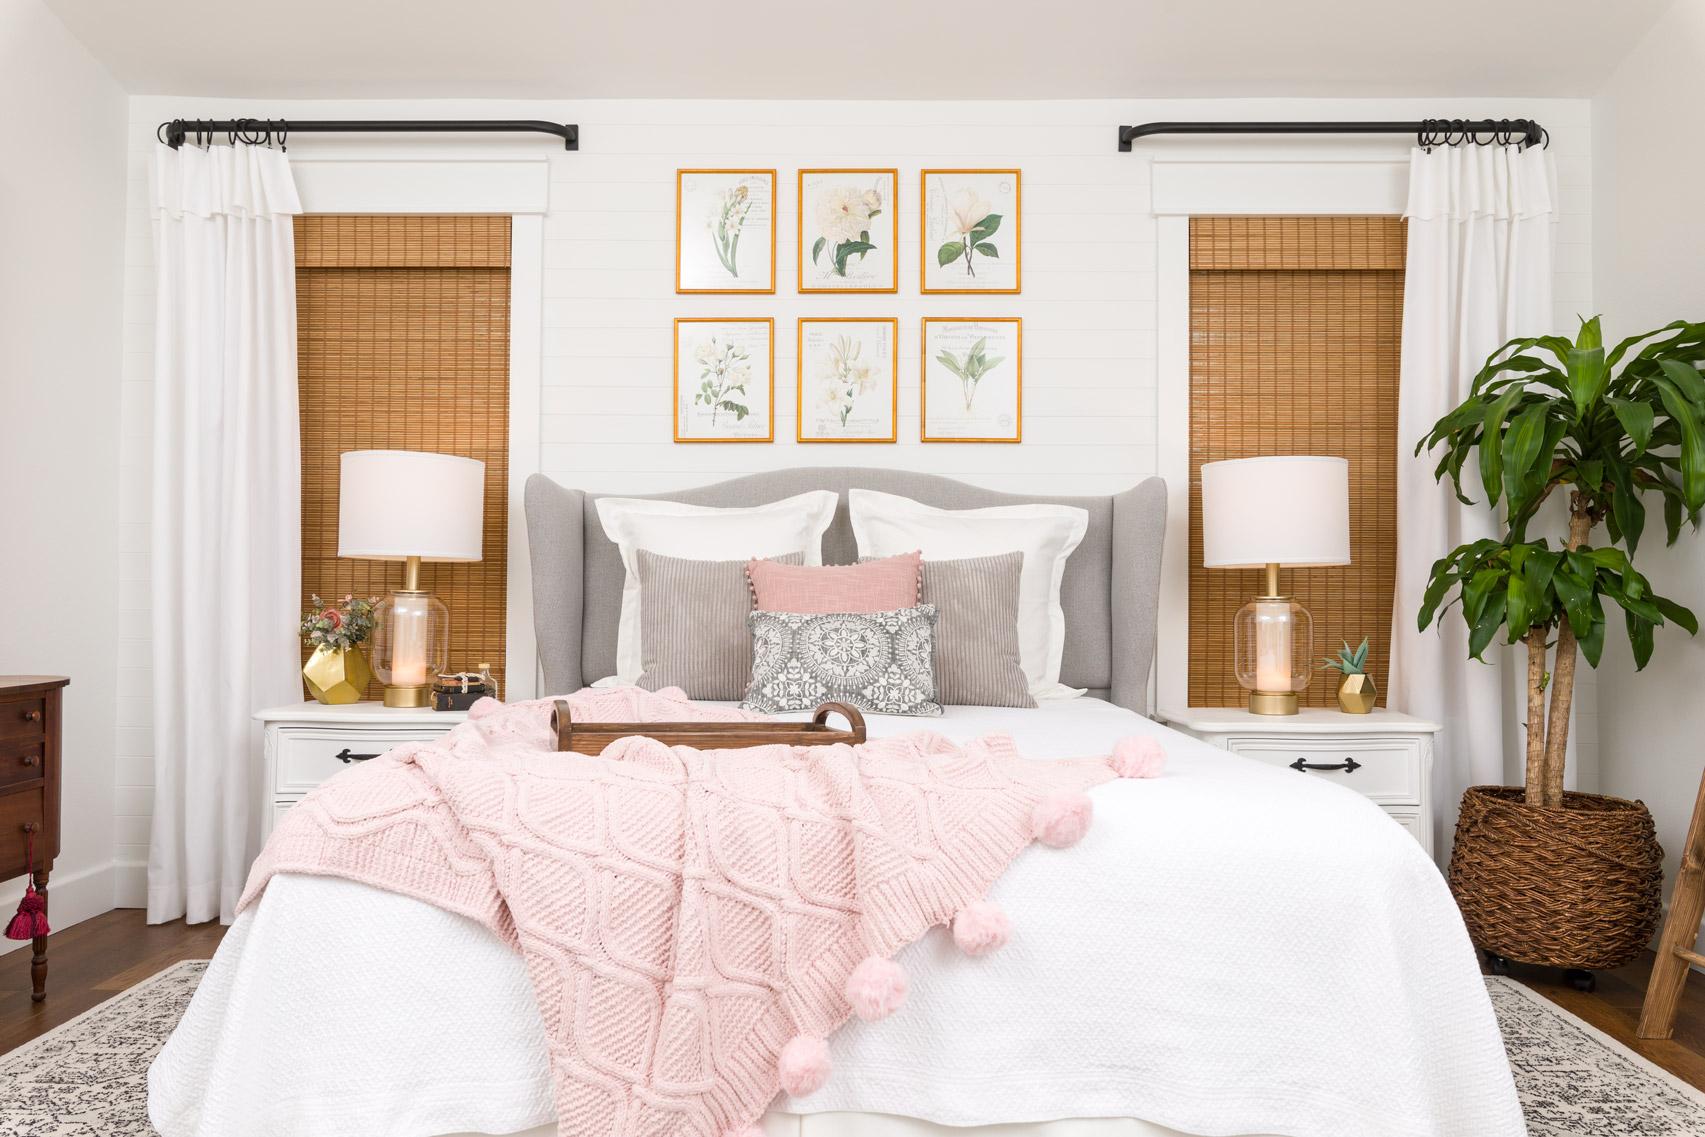 Bedroom Makeover with DIY headboard wingback